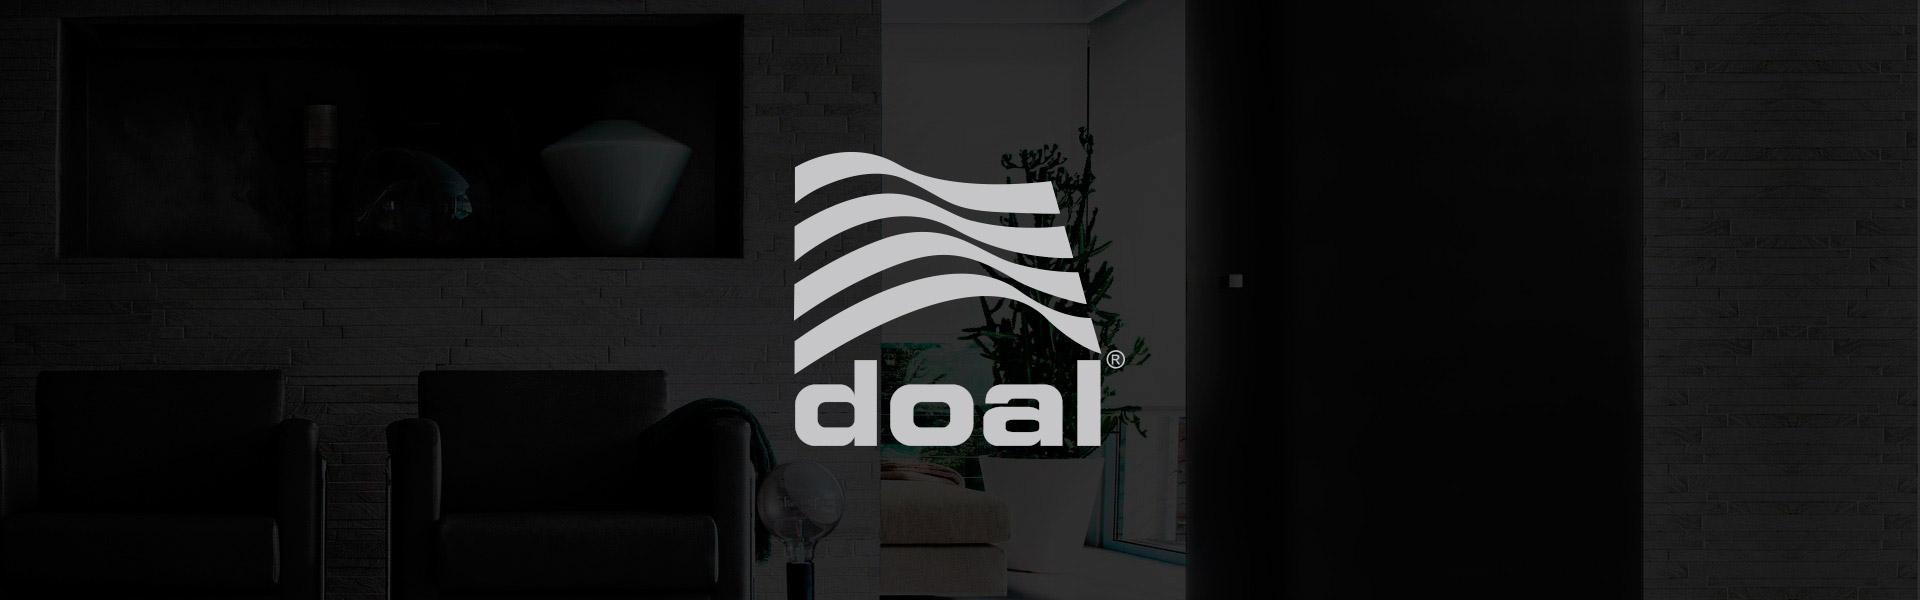 doal_02